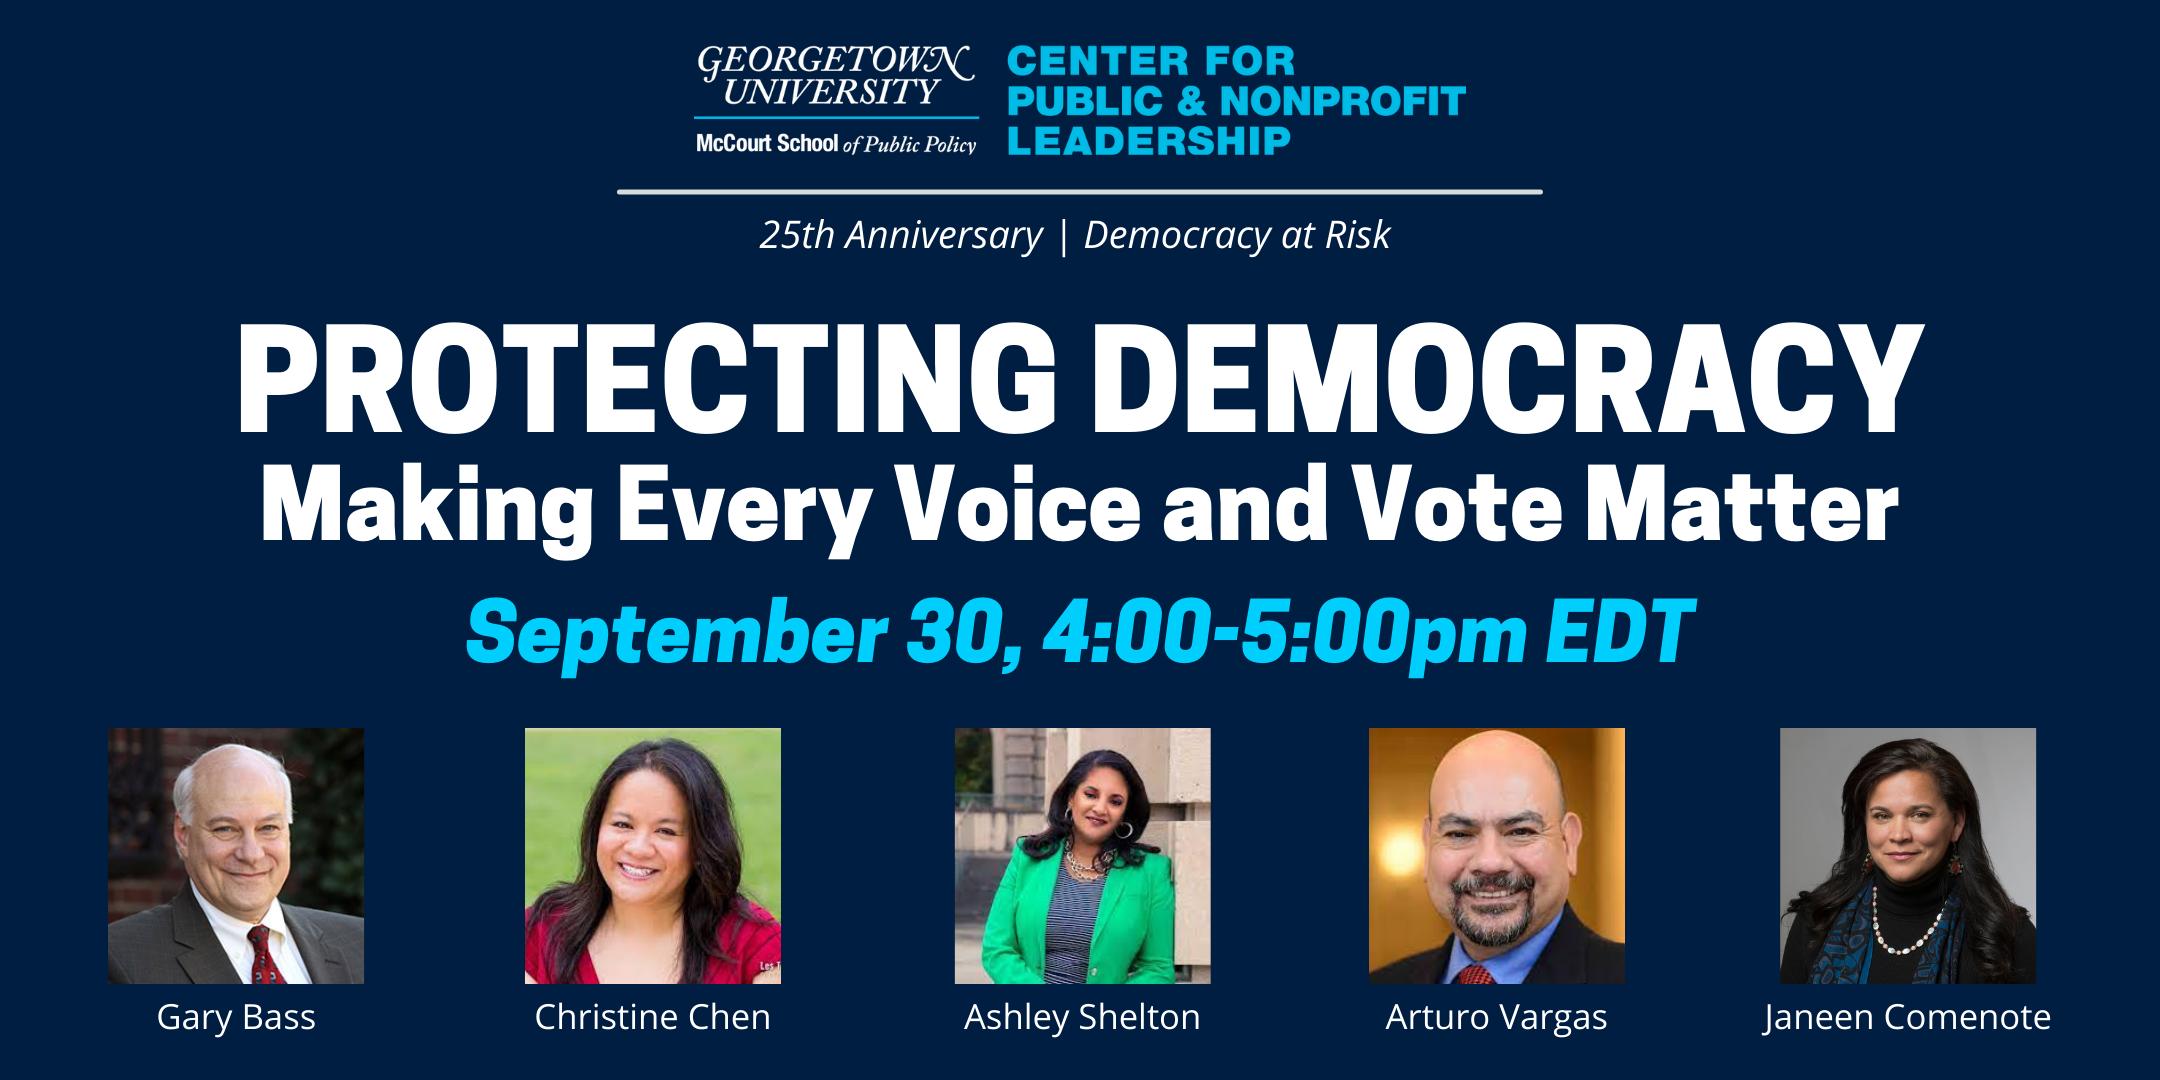 Protecting Democracy Eventbrite image